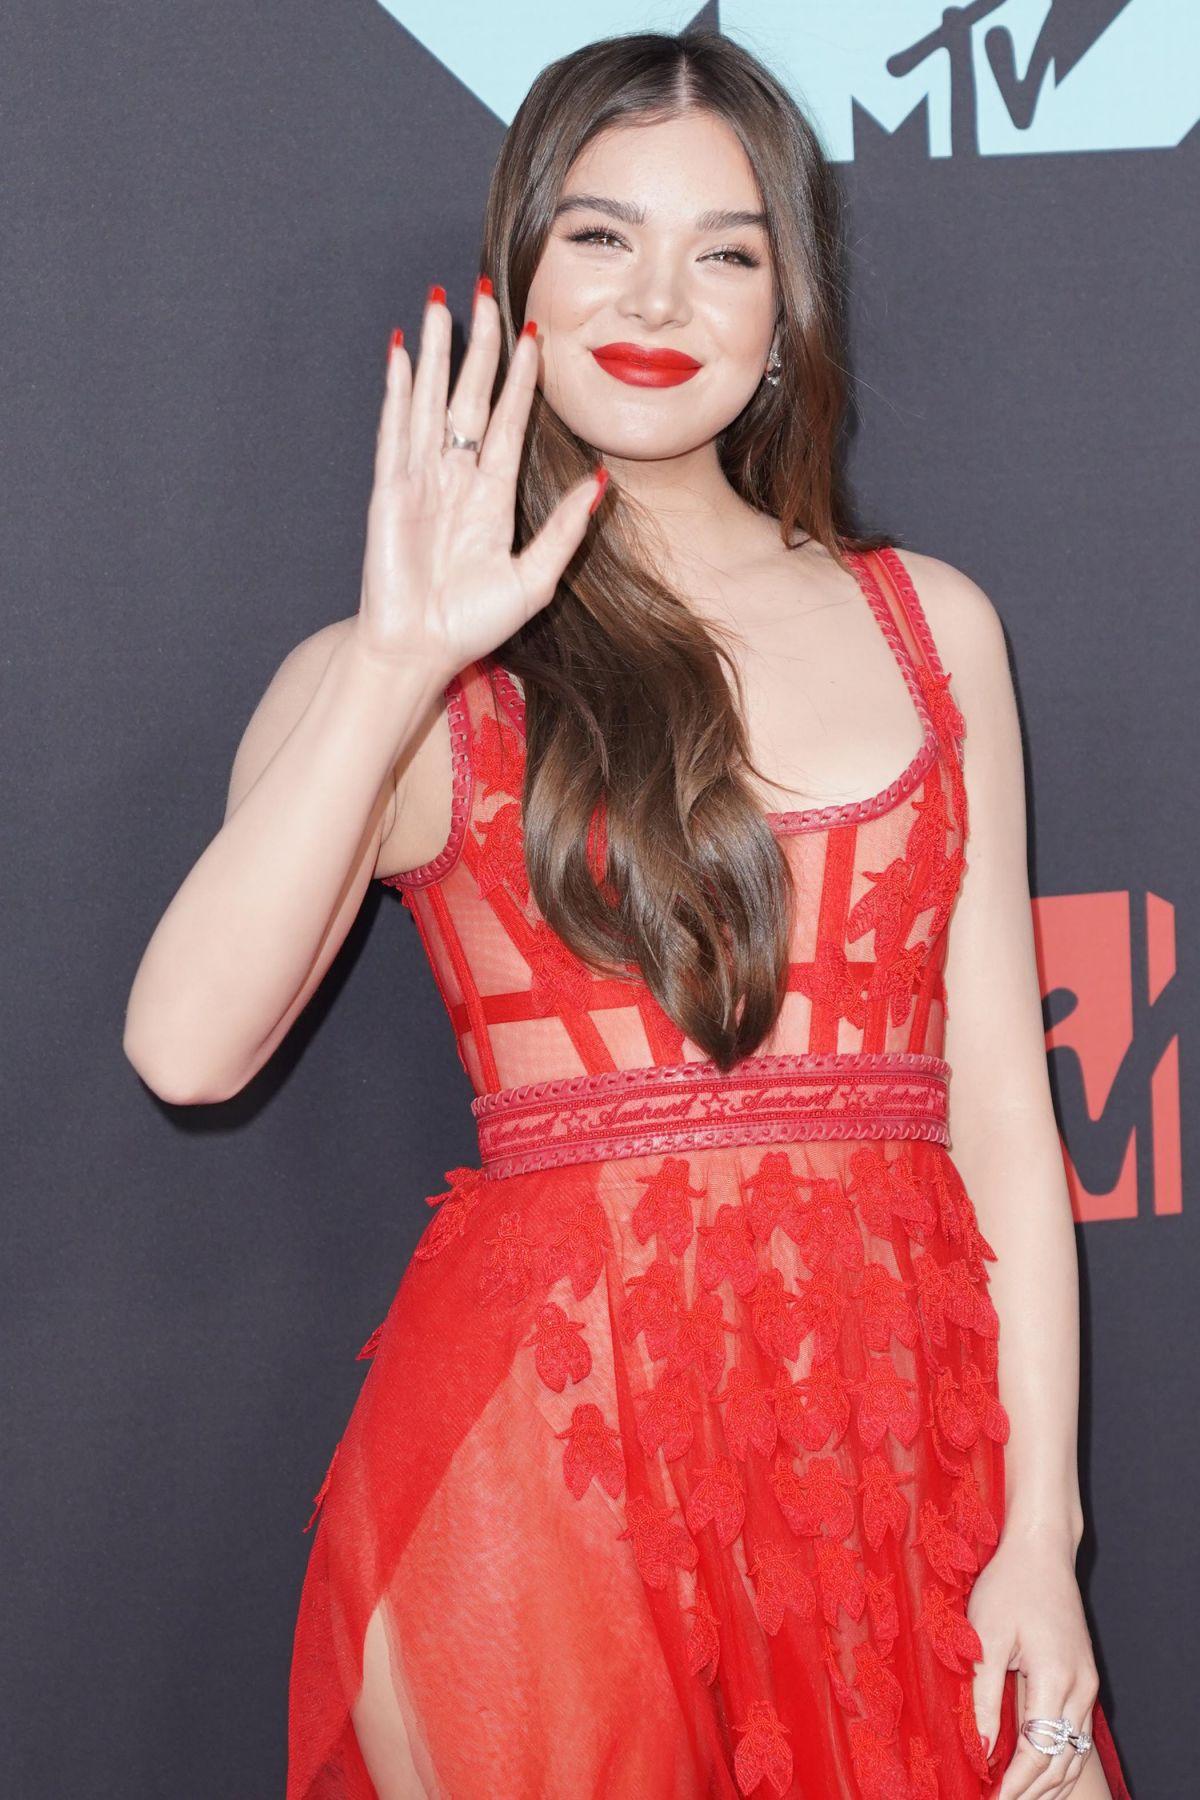 Hailee Steinfeld At 2019 Mtv Video Music Awards In Newark 08 26 2019 Hawtcelebs